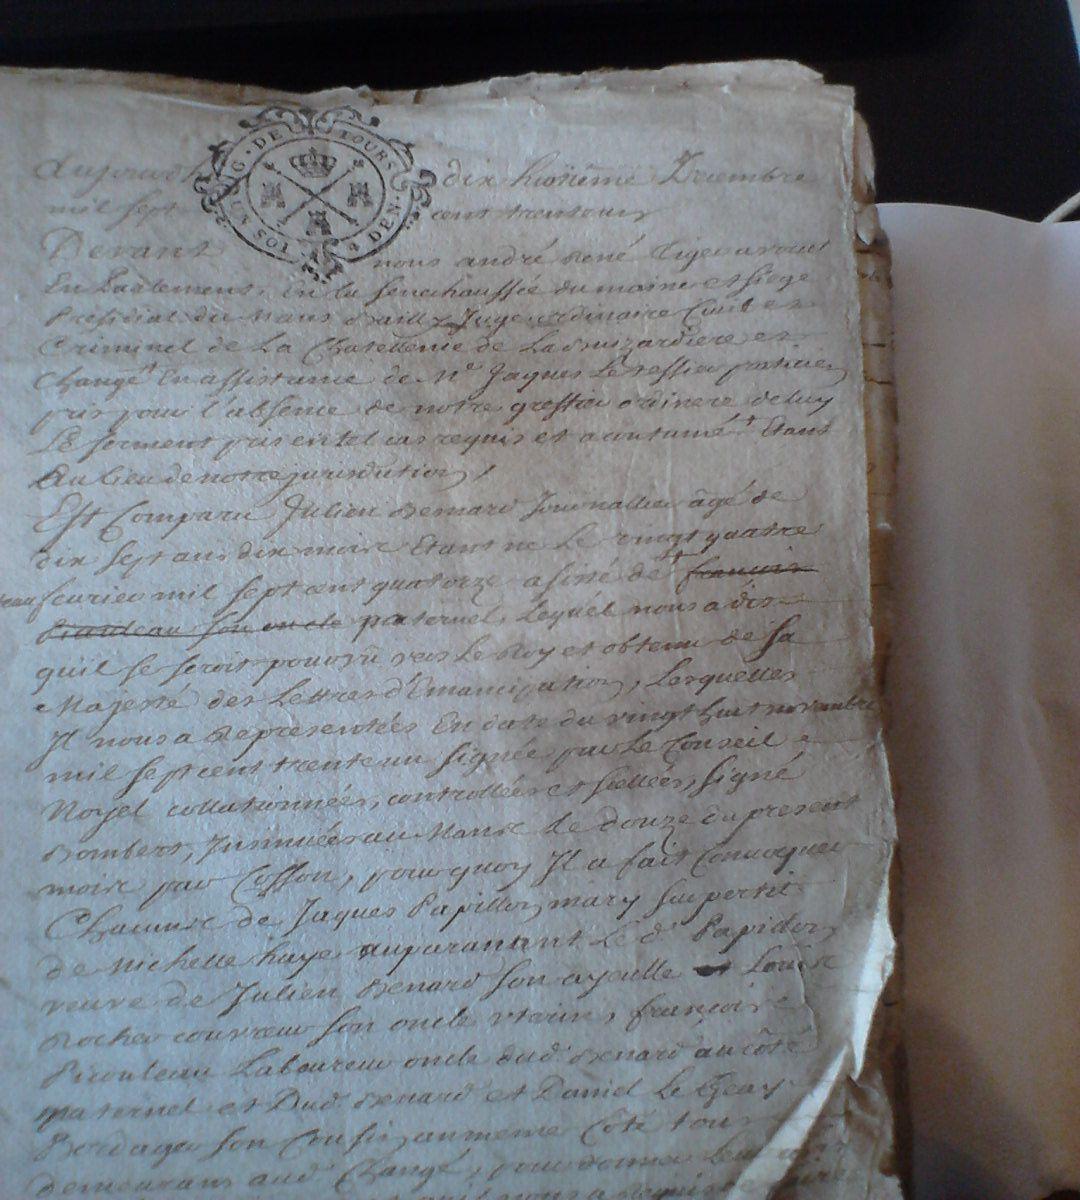 (4E 59 418) du notaire Montarou julien